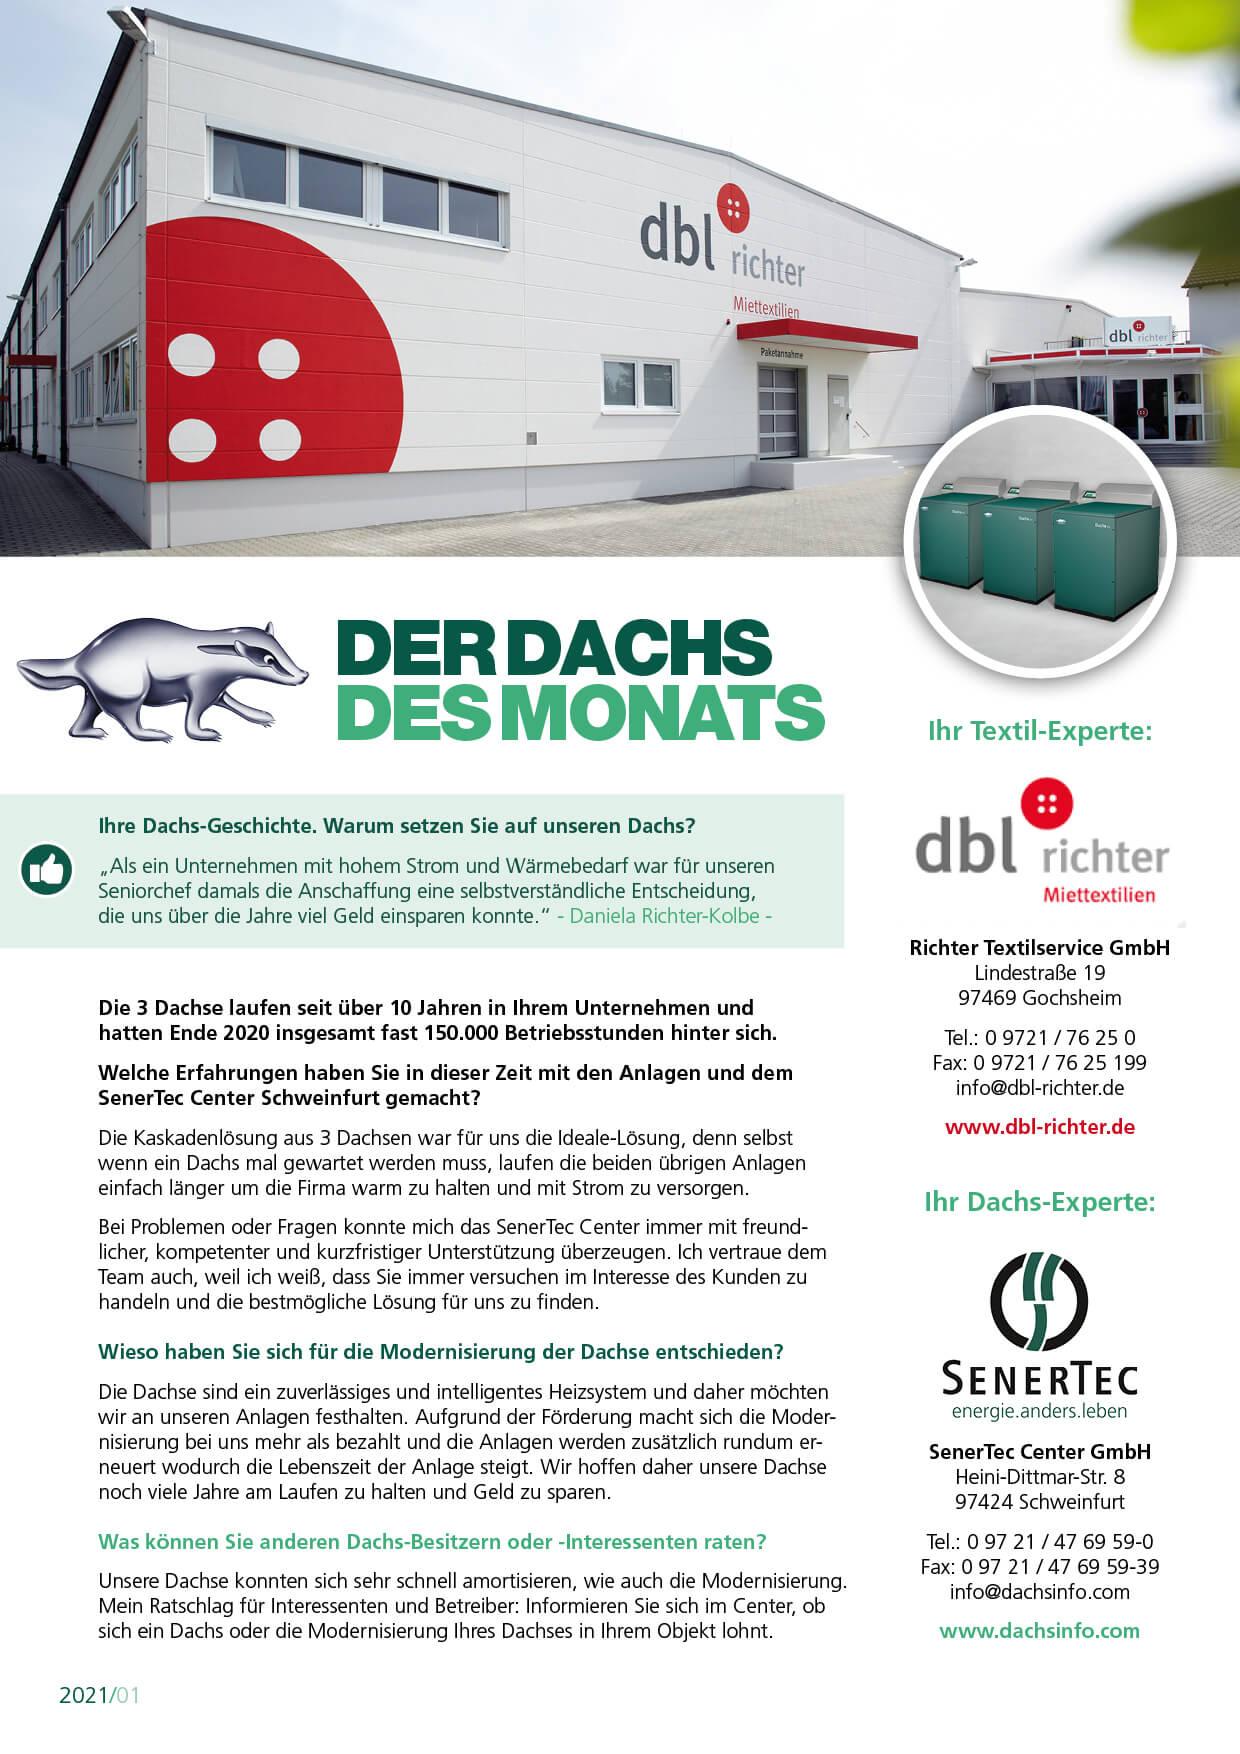 DBL-Richter Dachs des Monats SenerTec Center Schweinfurt